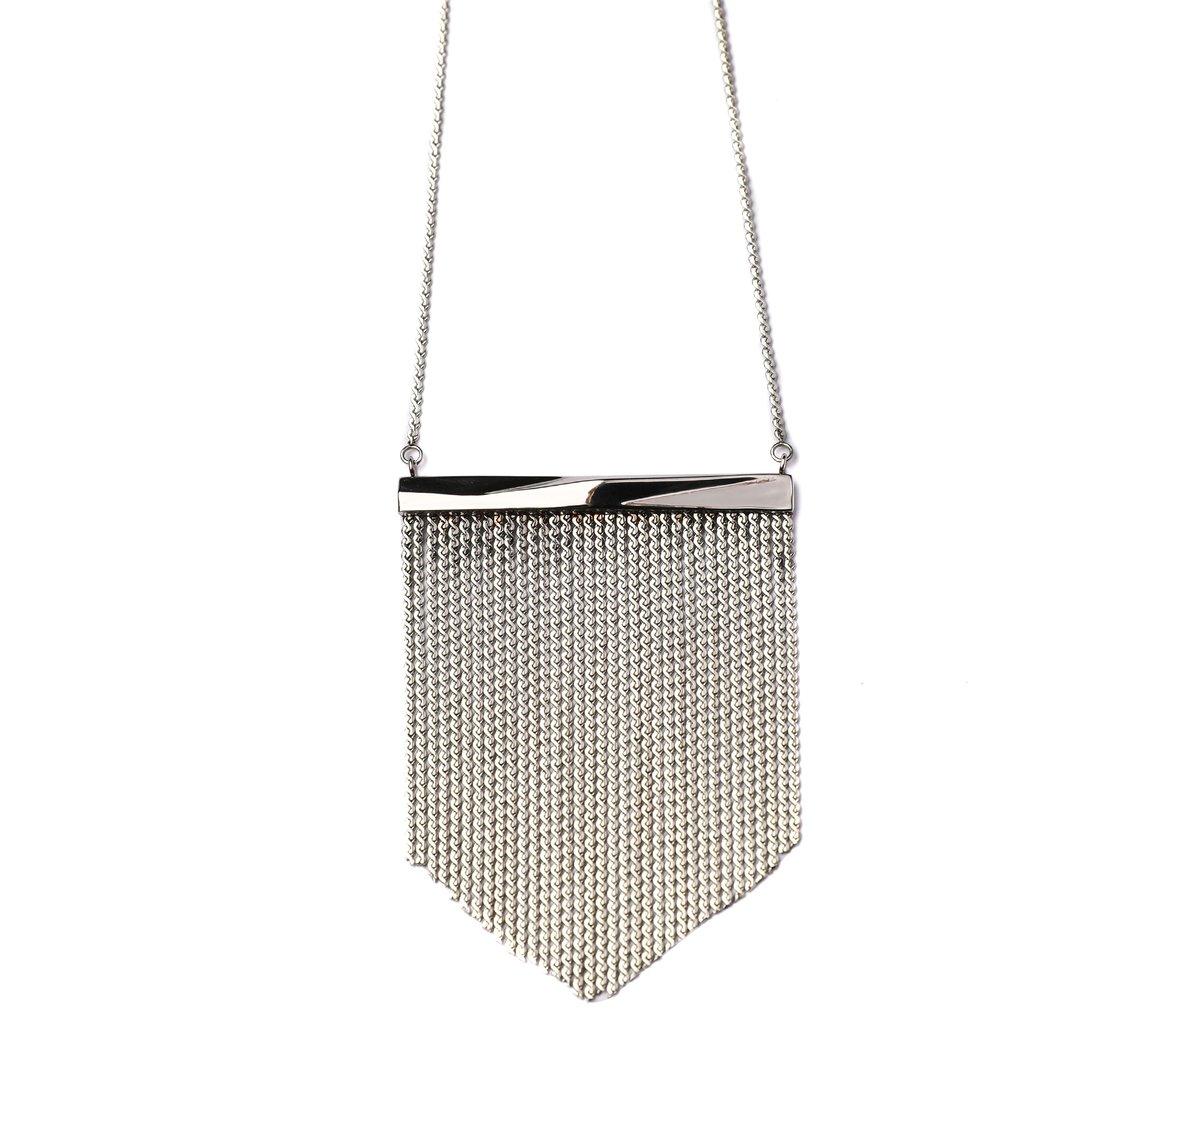 Image of Necklace - FACADE